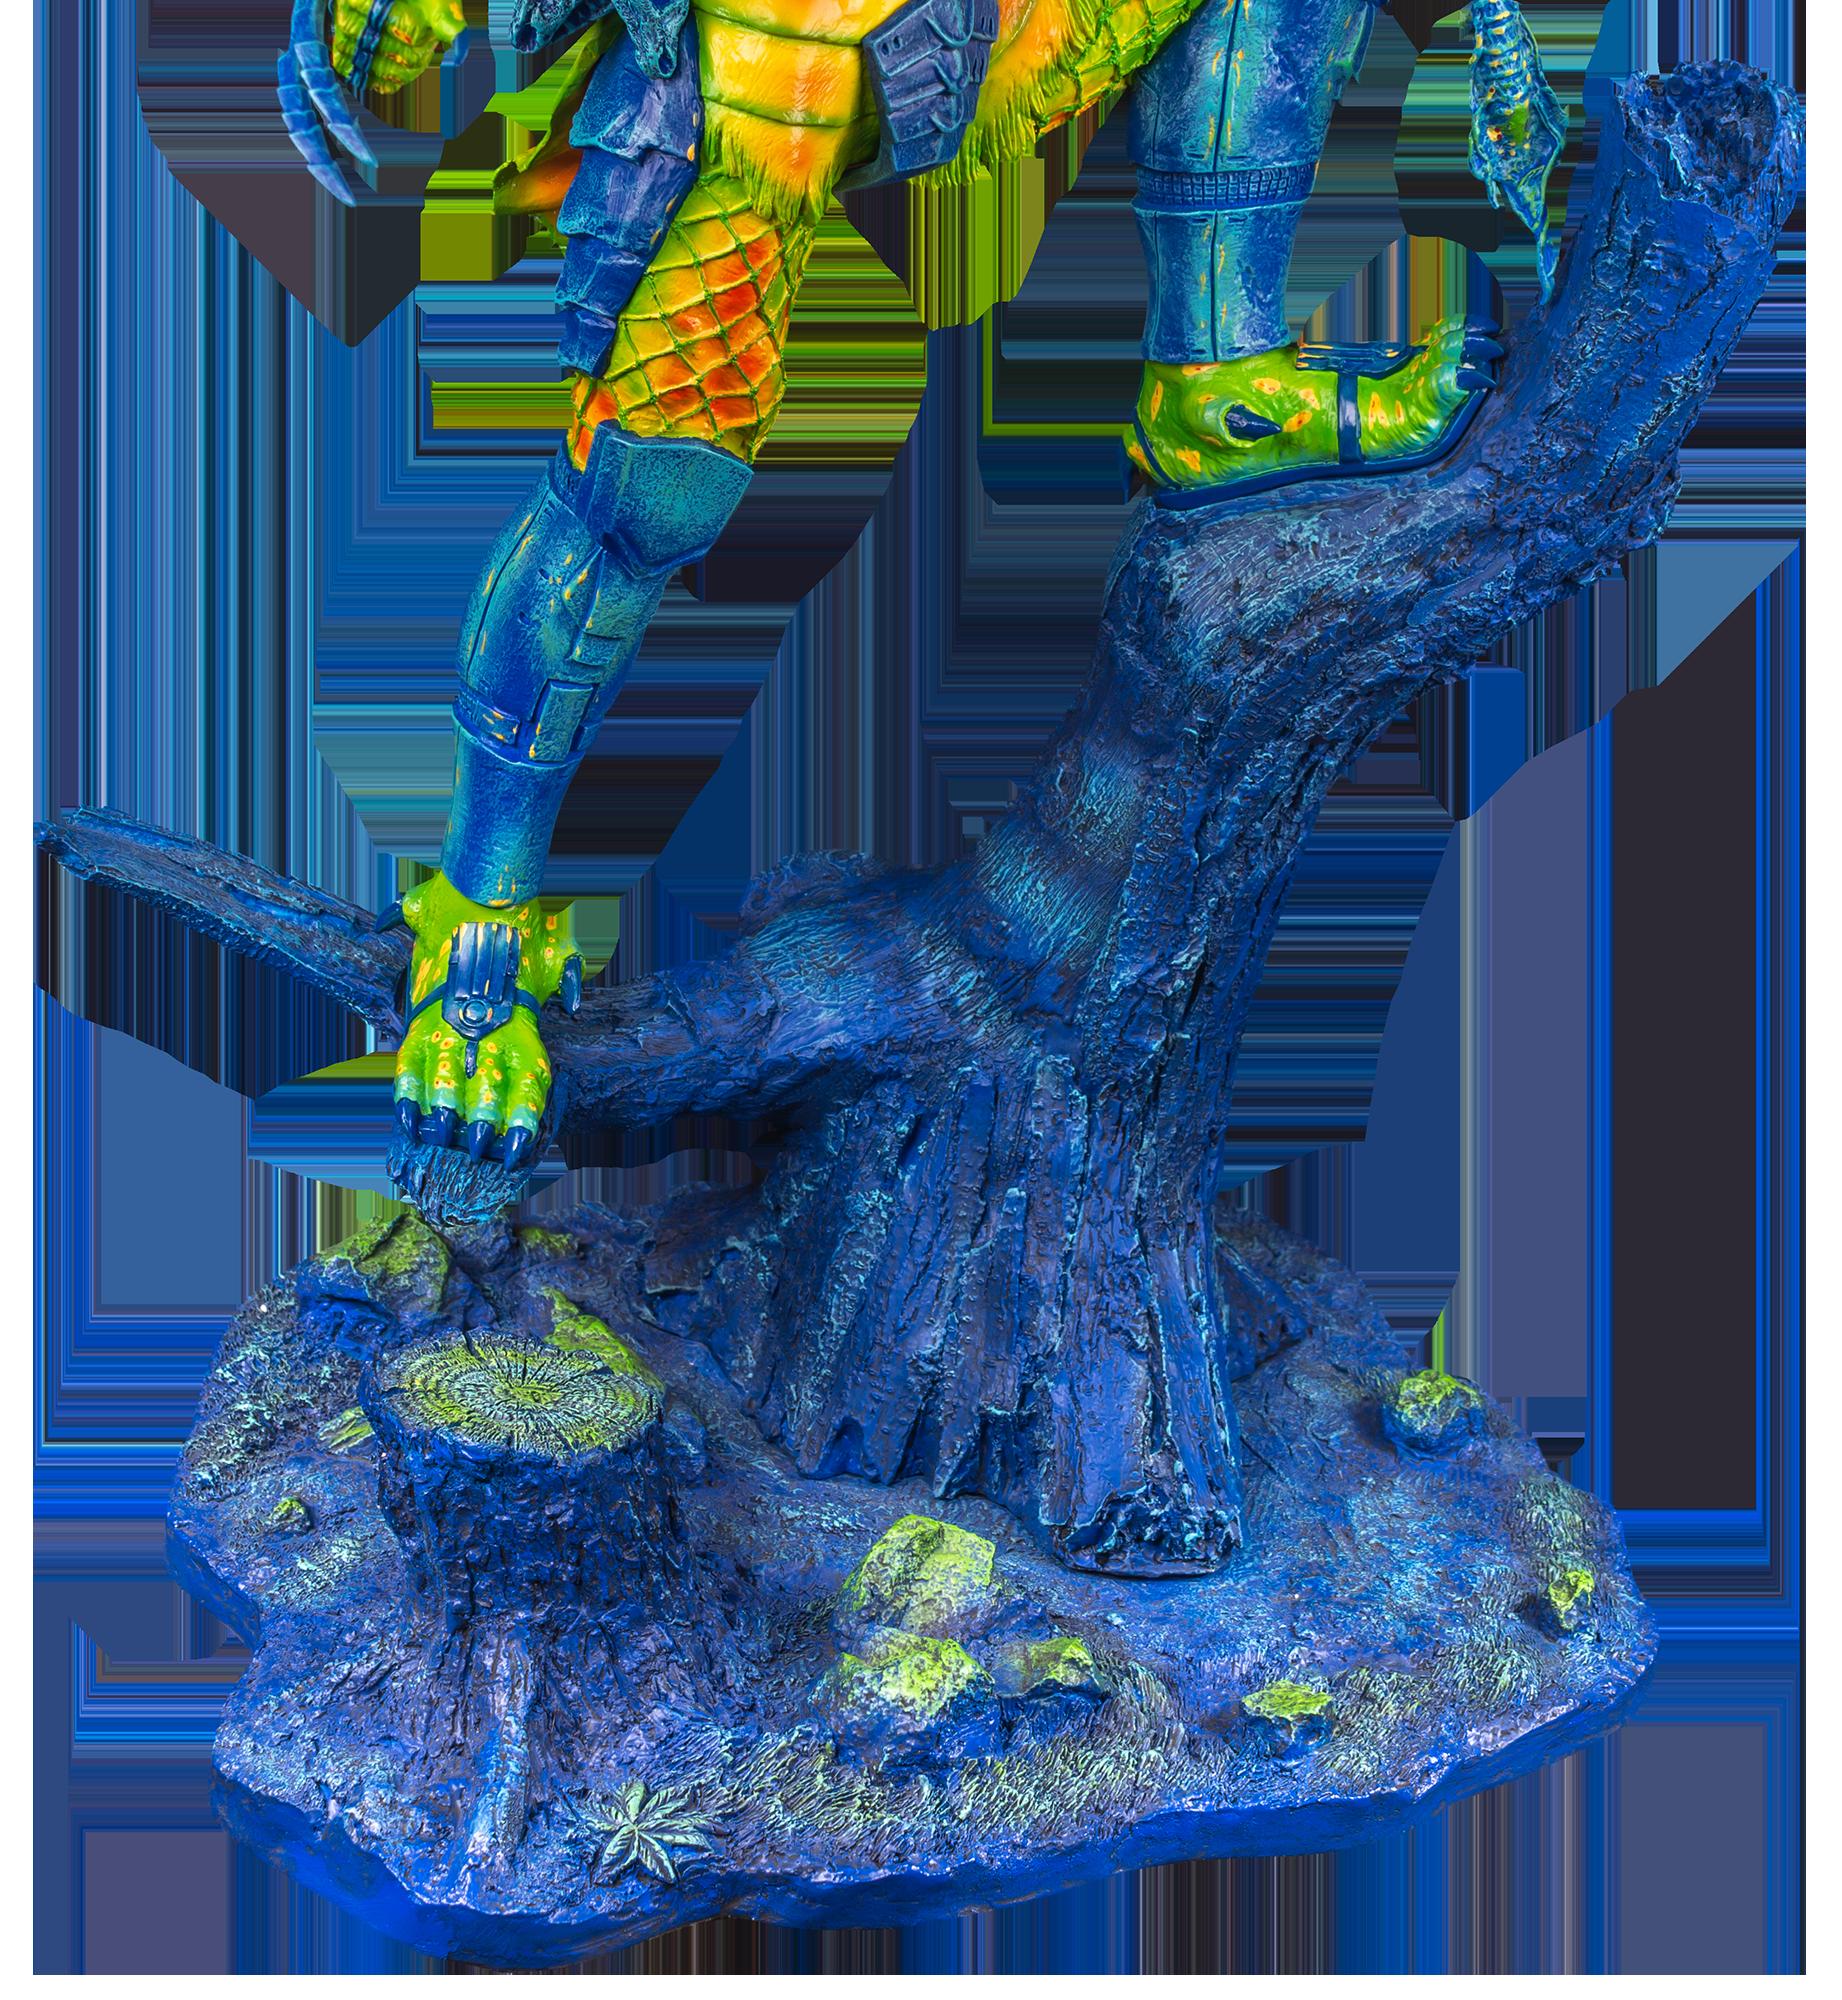 IKO1571-Thermal-Vision-Predator-Statue-POPCULTCHA-EXCLUSIVE-10.png